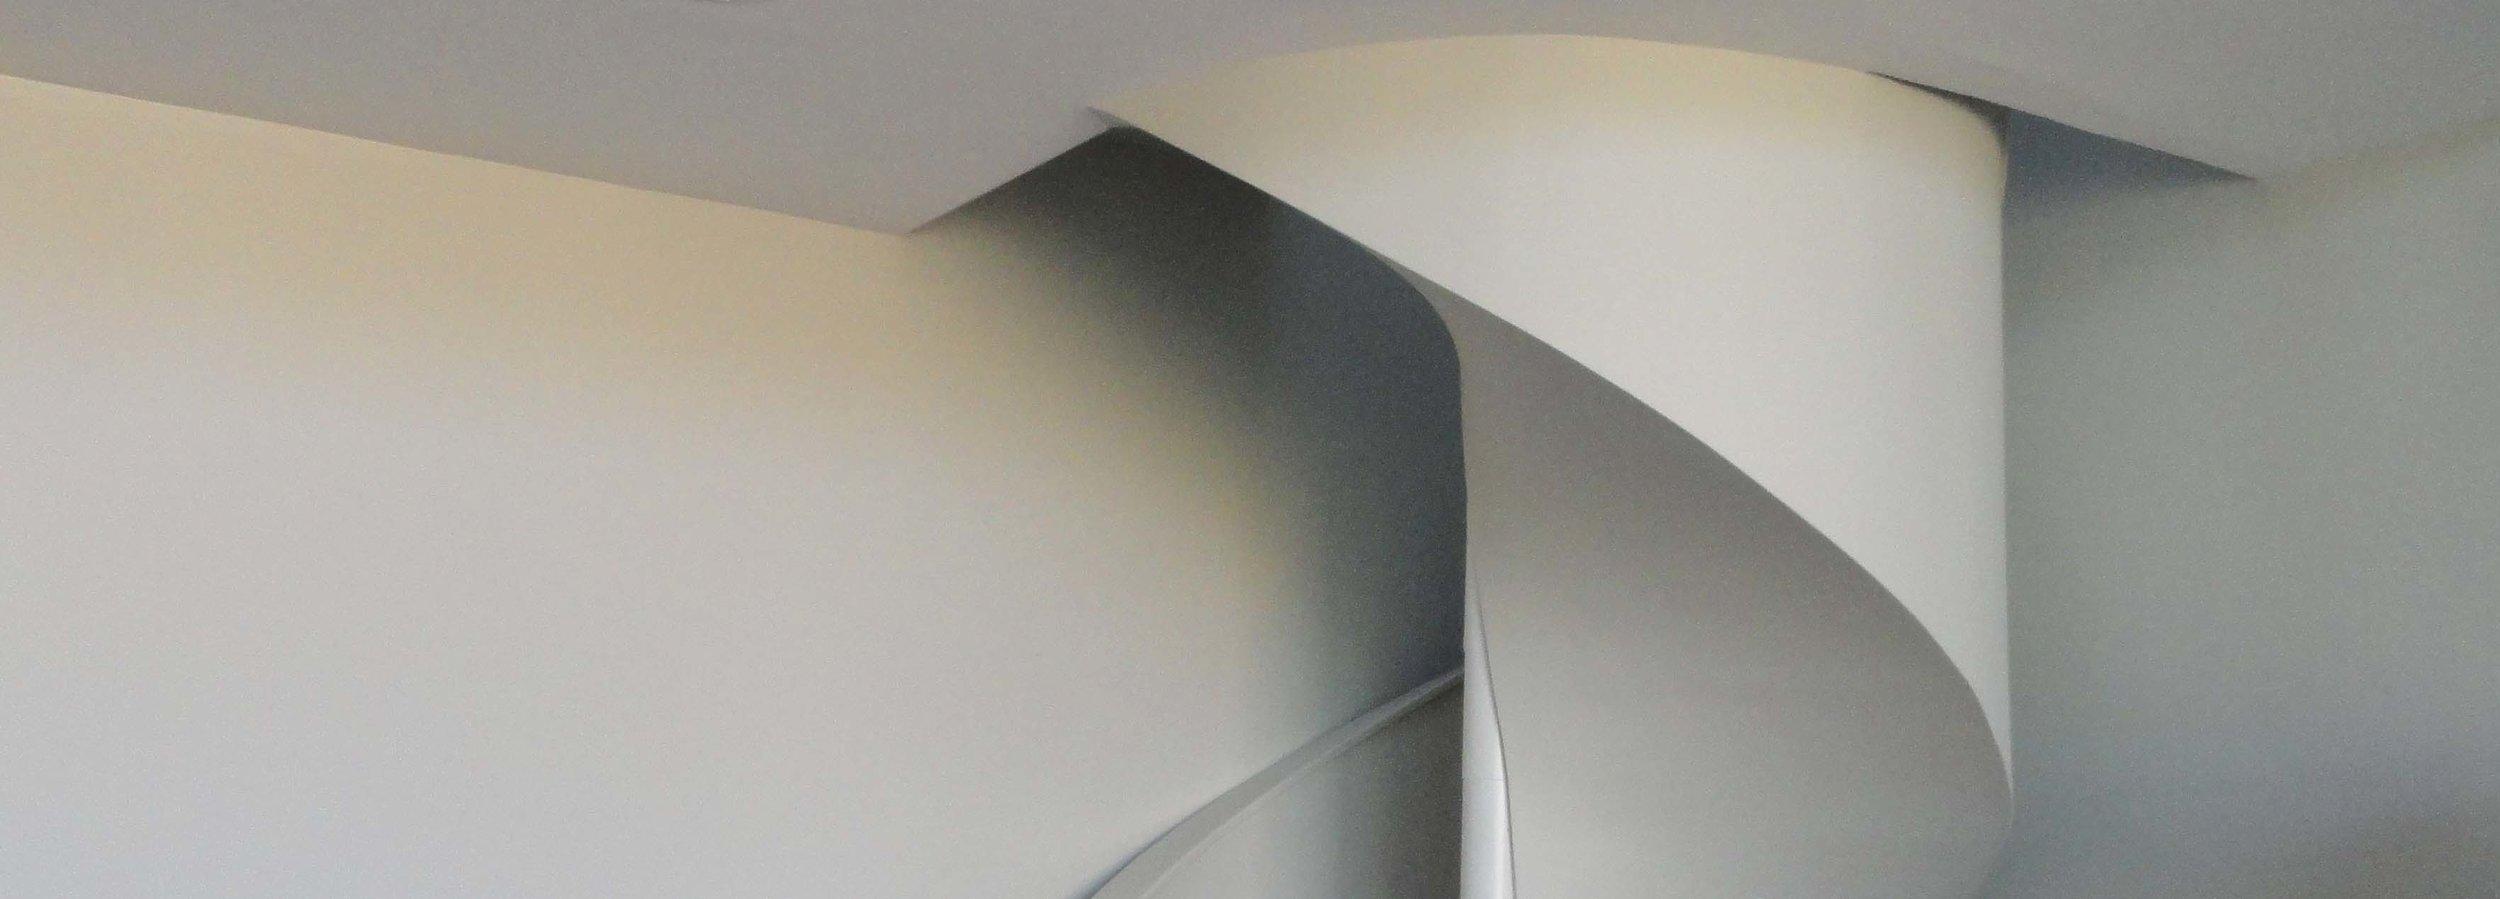 DameronArchitecture_BrooklynHeights_detail1.jpg